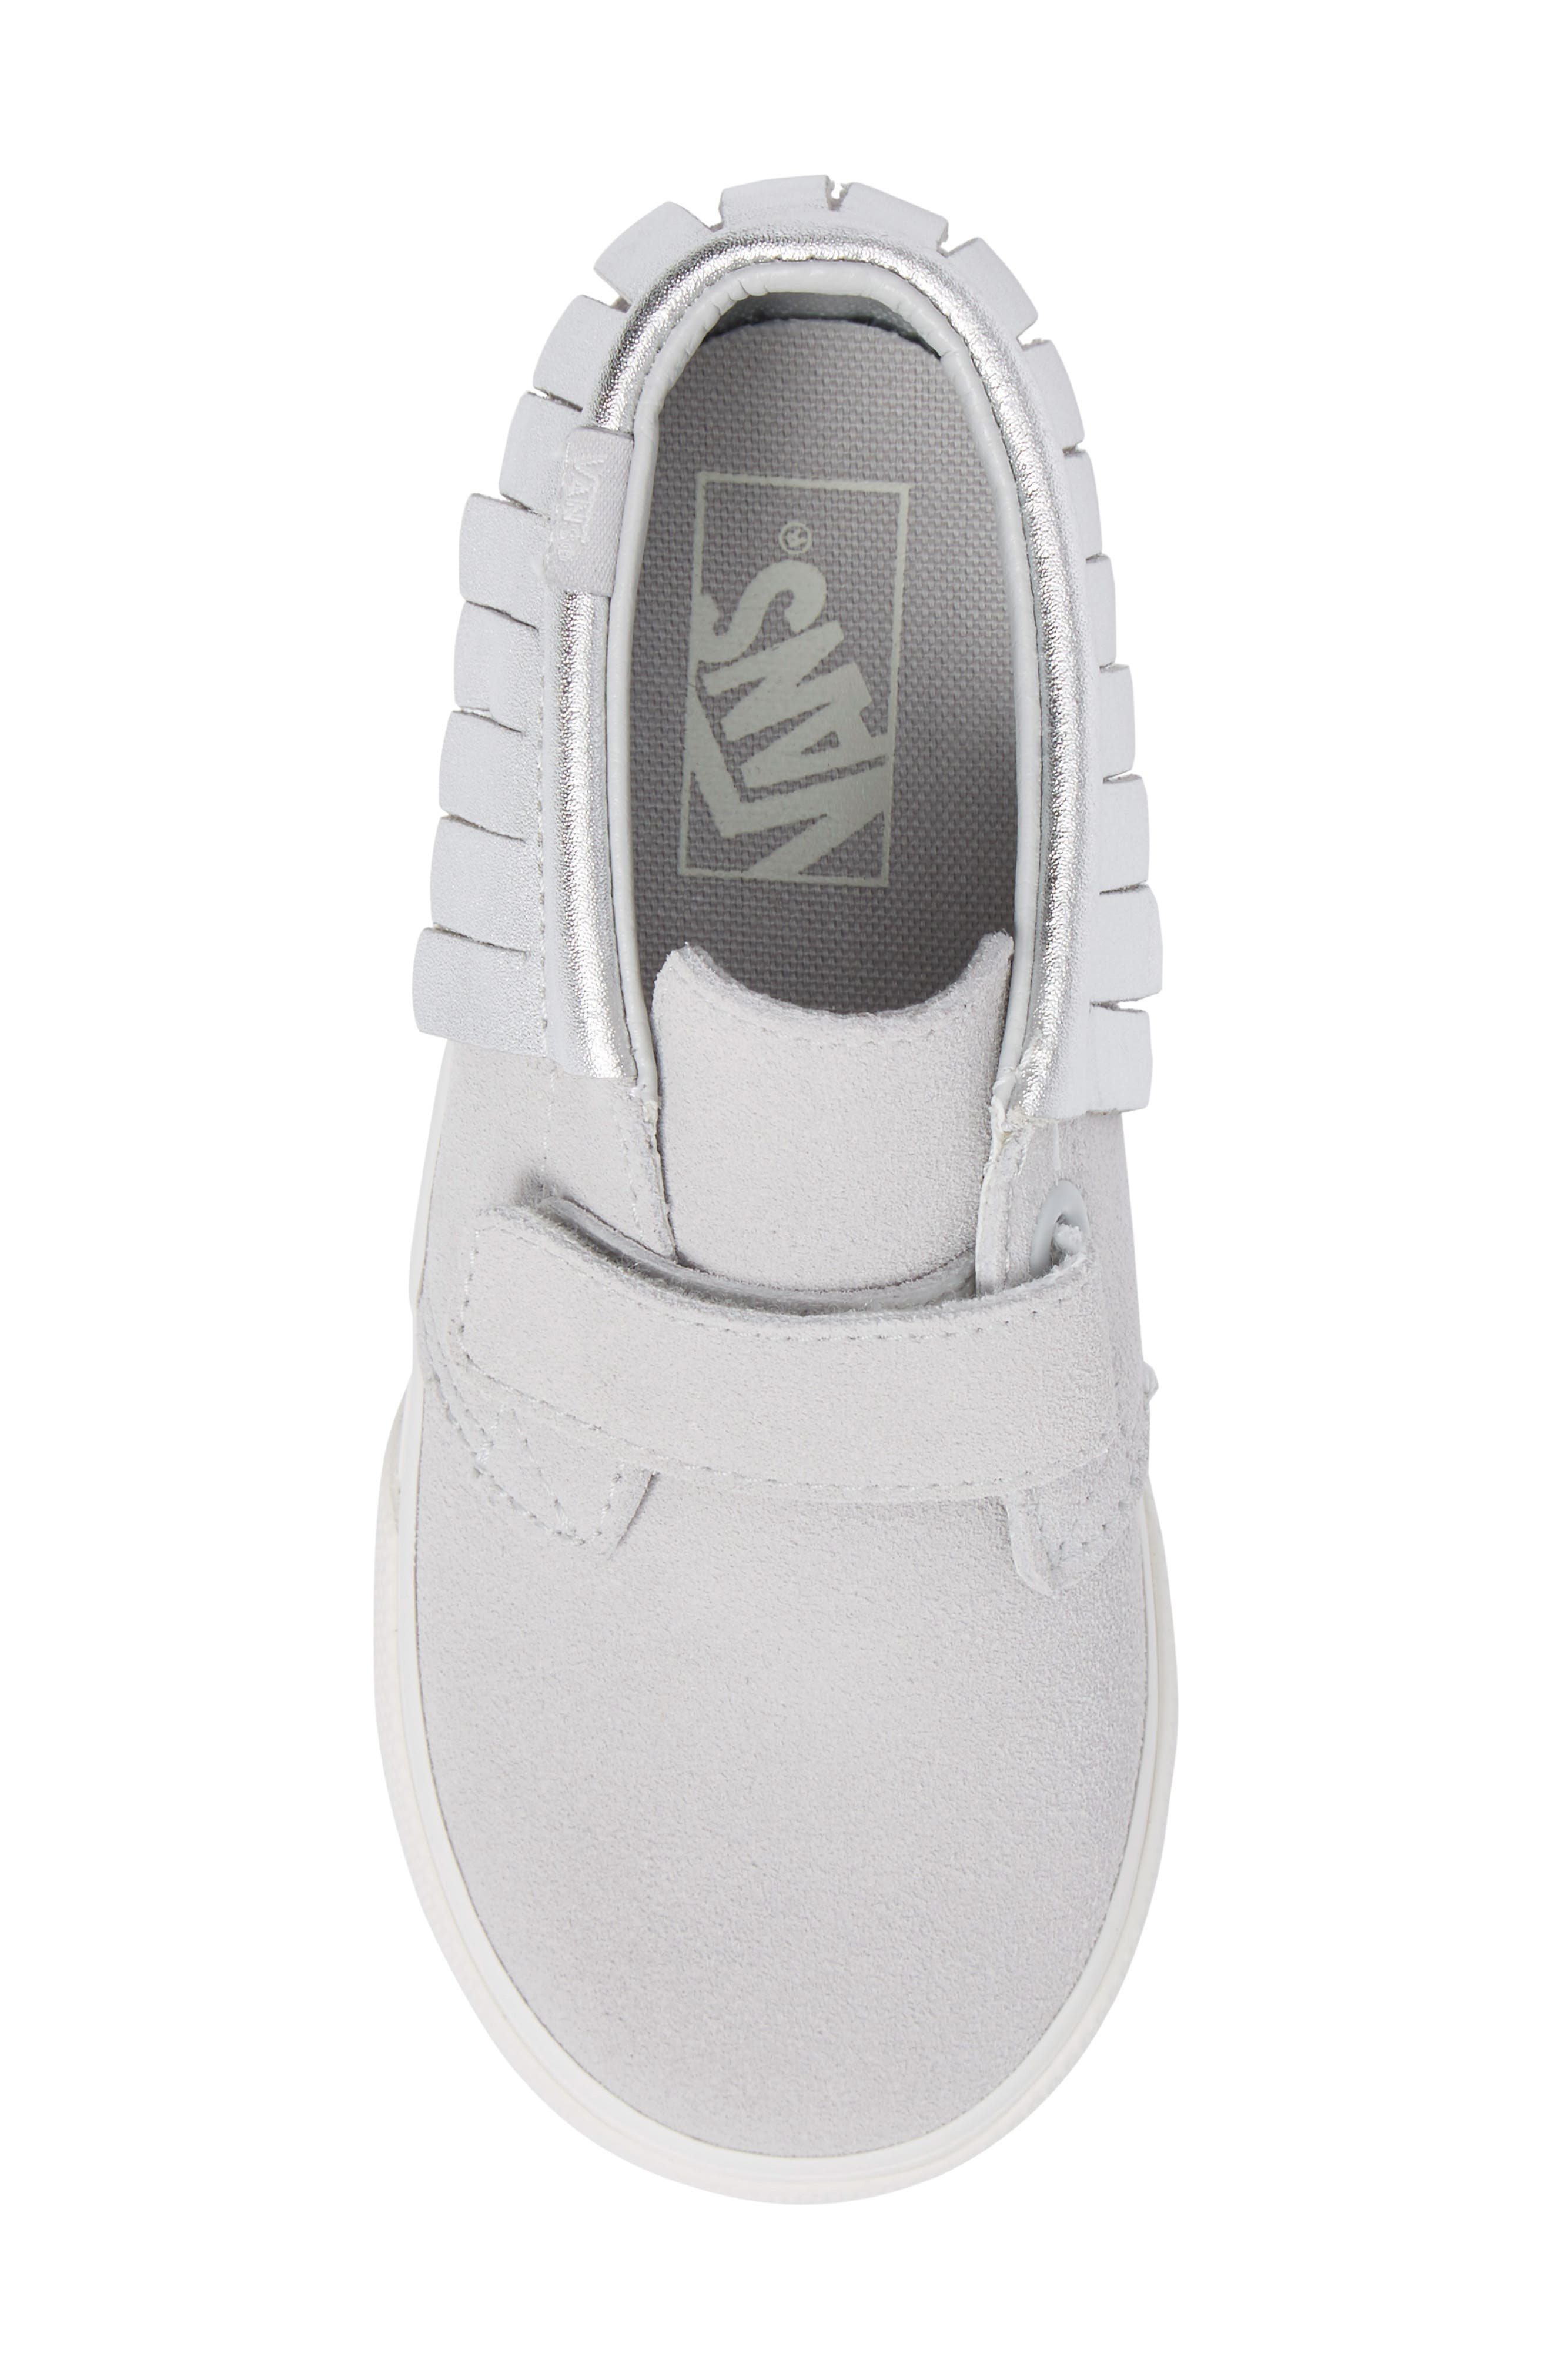 Chukka V Moc Sneaker,                             Alternate thumbnail 5, color,                             040